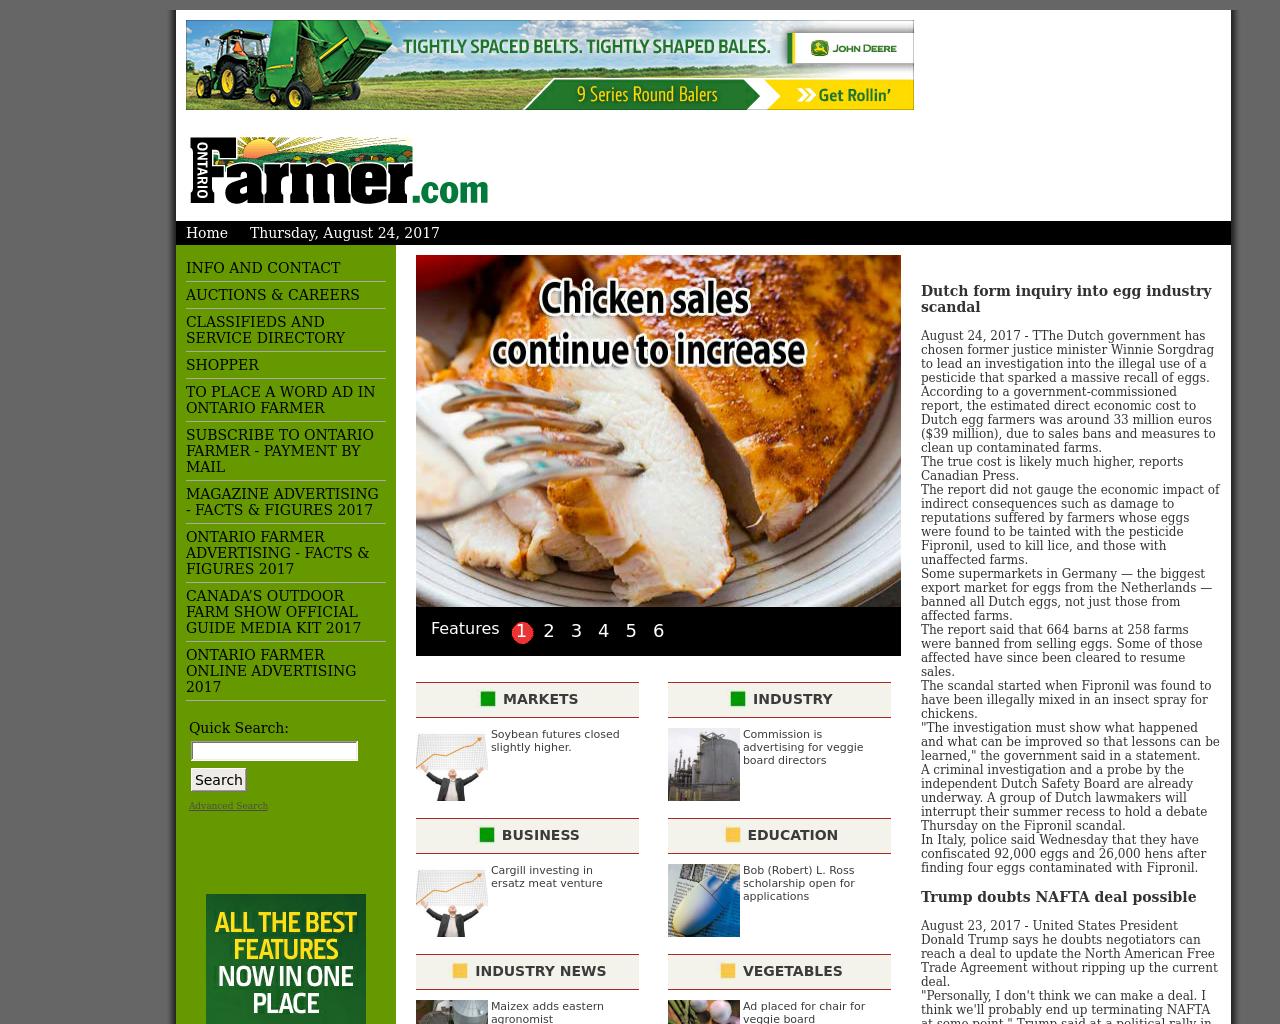 ONTARIO-FARMER.com-Advertising-Reviews-Pricing